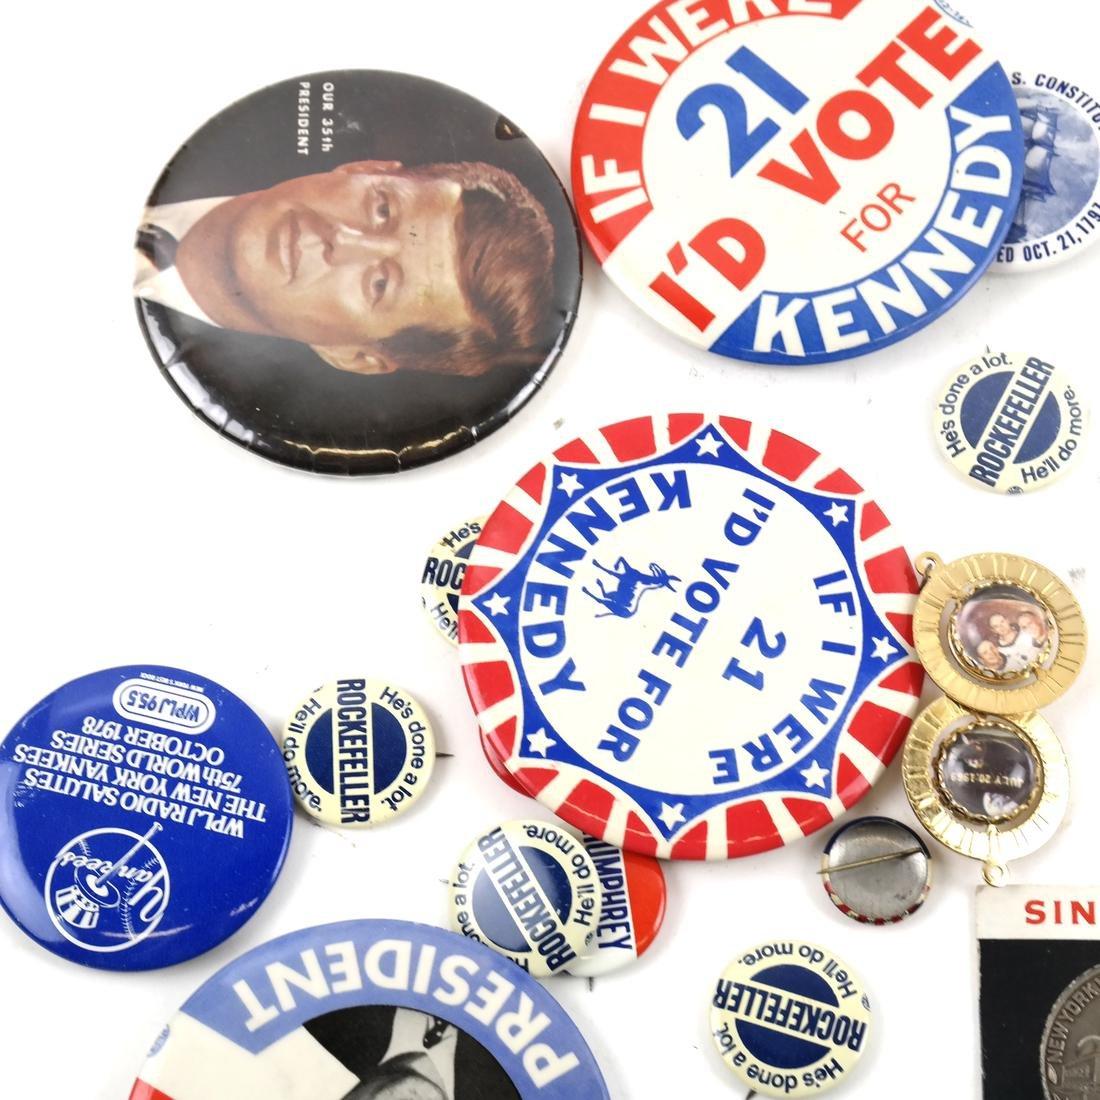 Political Pins and Memorabilia - Kennedy and Nixon - 2